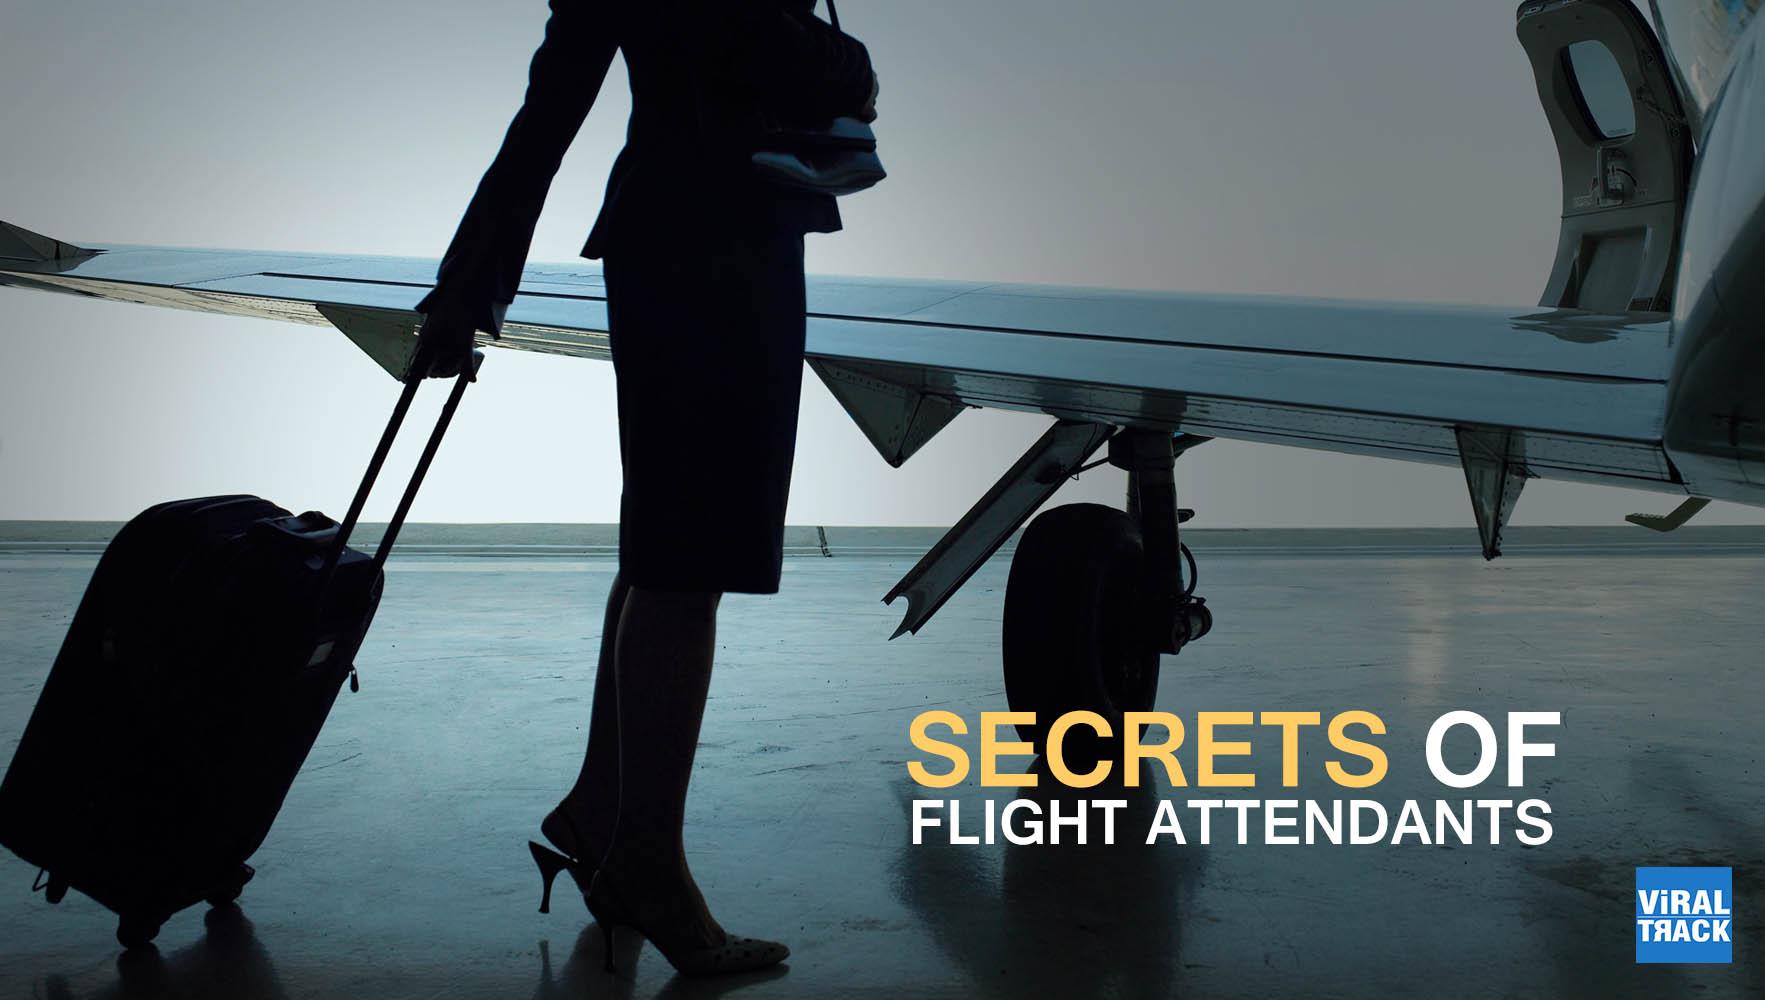 secrets of flight attendants